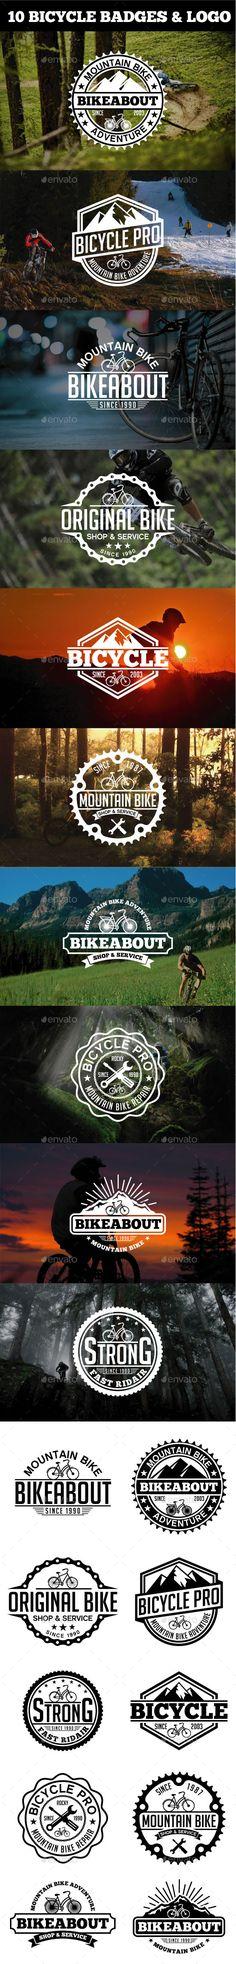 Sport Bicycle Badges & Logo #design Download: http://graphicriver.net/item/sport-bicycle-badges-logo/11481387?ref=ksioks